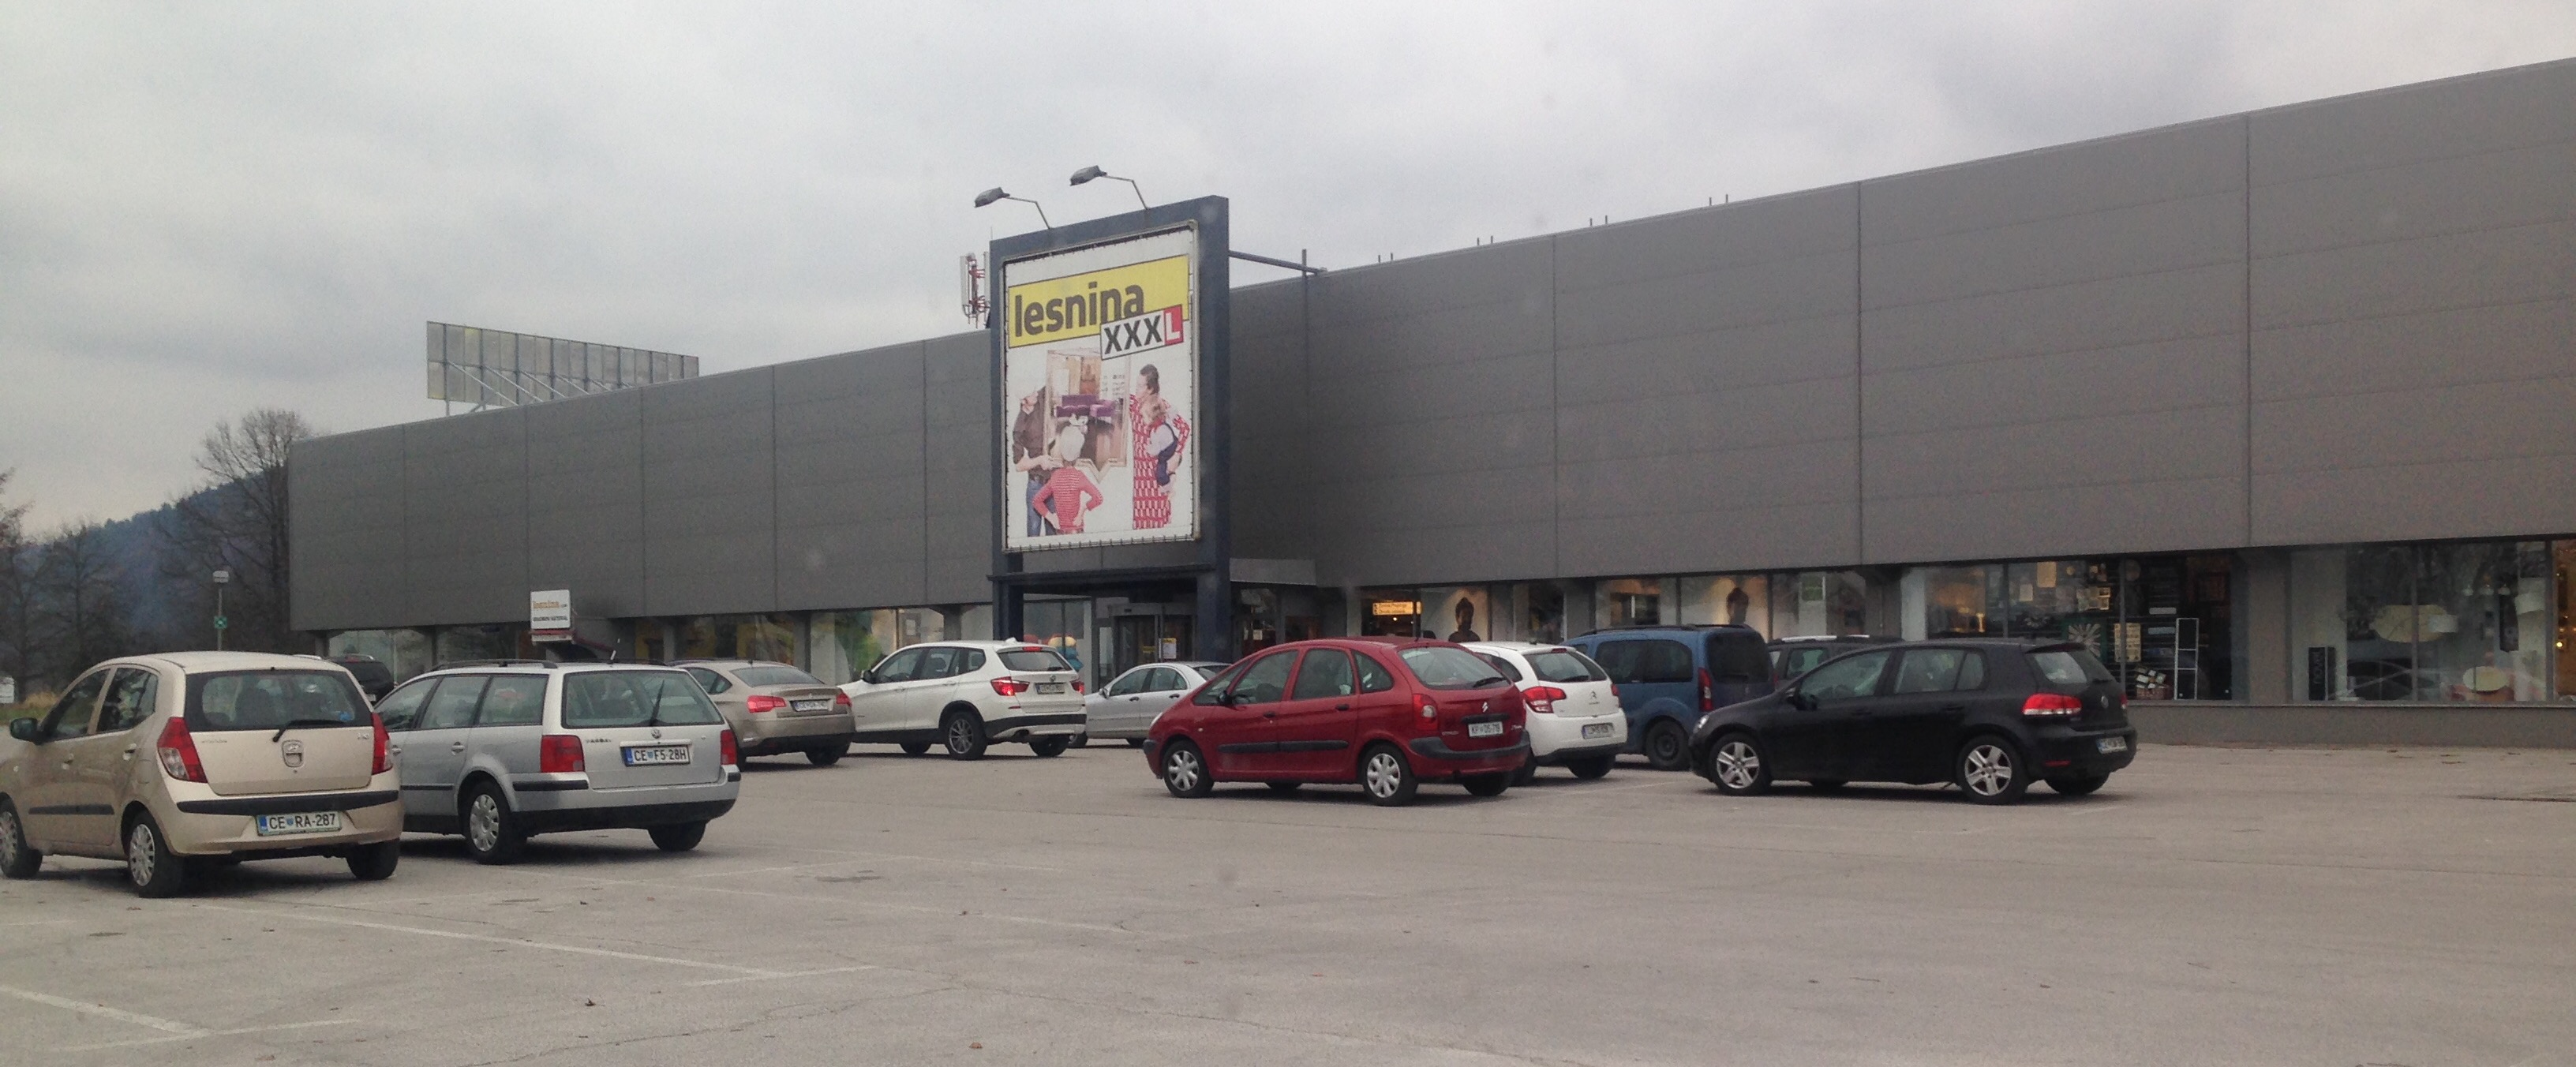 Lesnina XXXL, Levec, trgovina s pohištvom